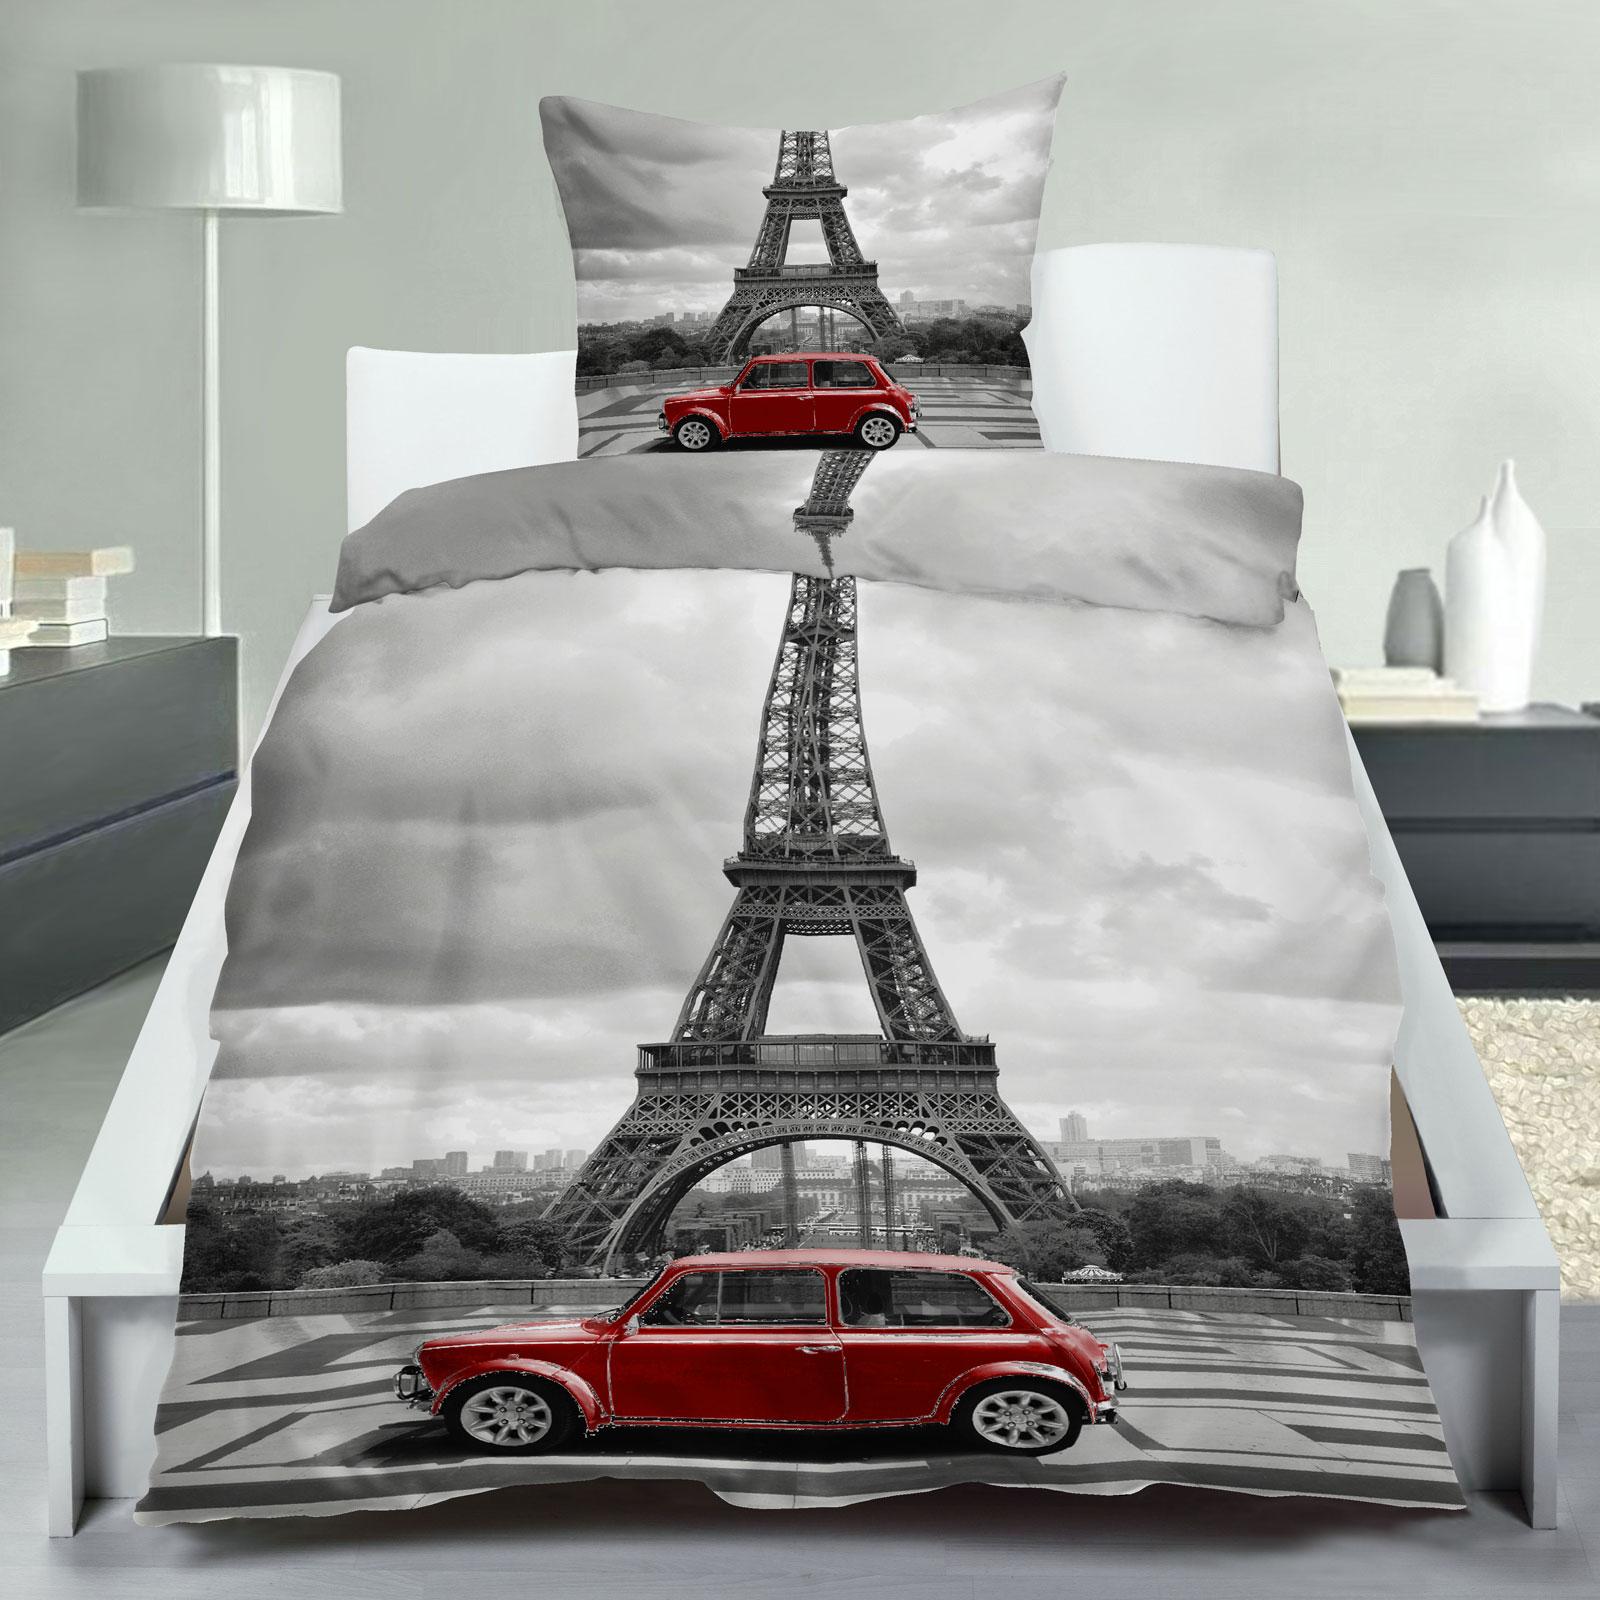 bettw sche eiffelturm paris microfaser 135x200 art nr 114231 ebay. Black Bedroom Furniture Sets. Home Design Ideas